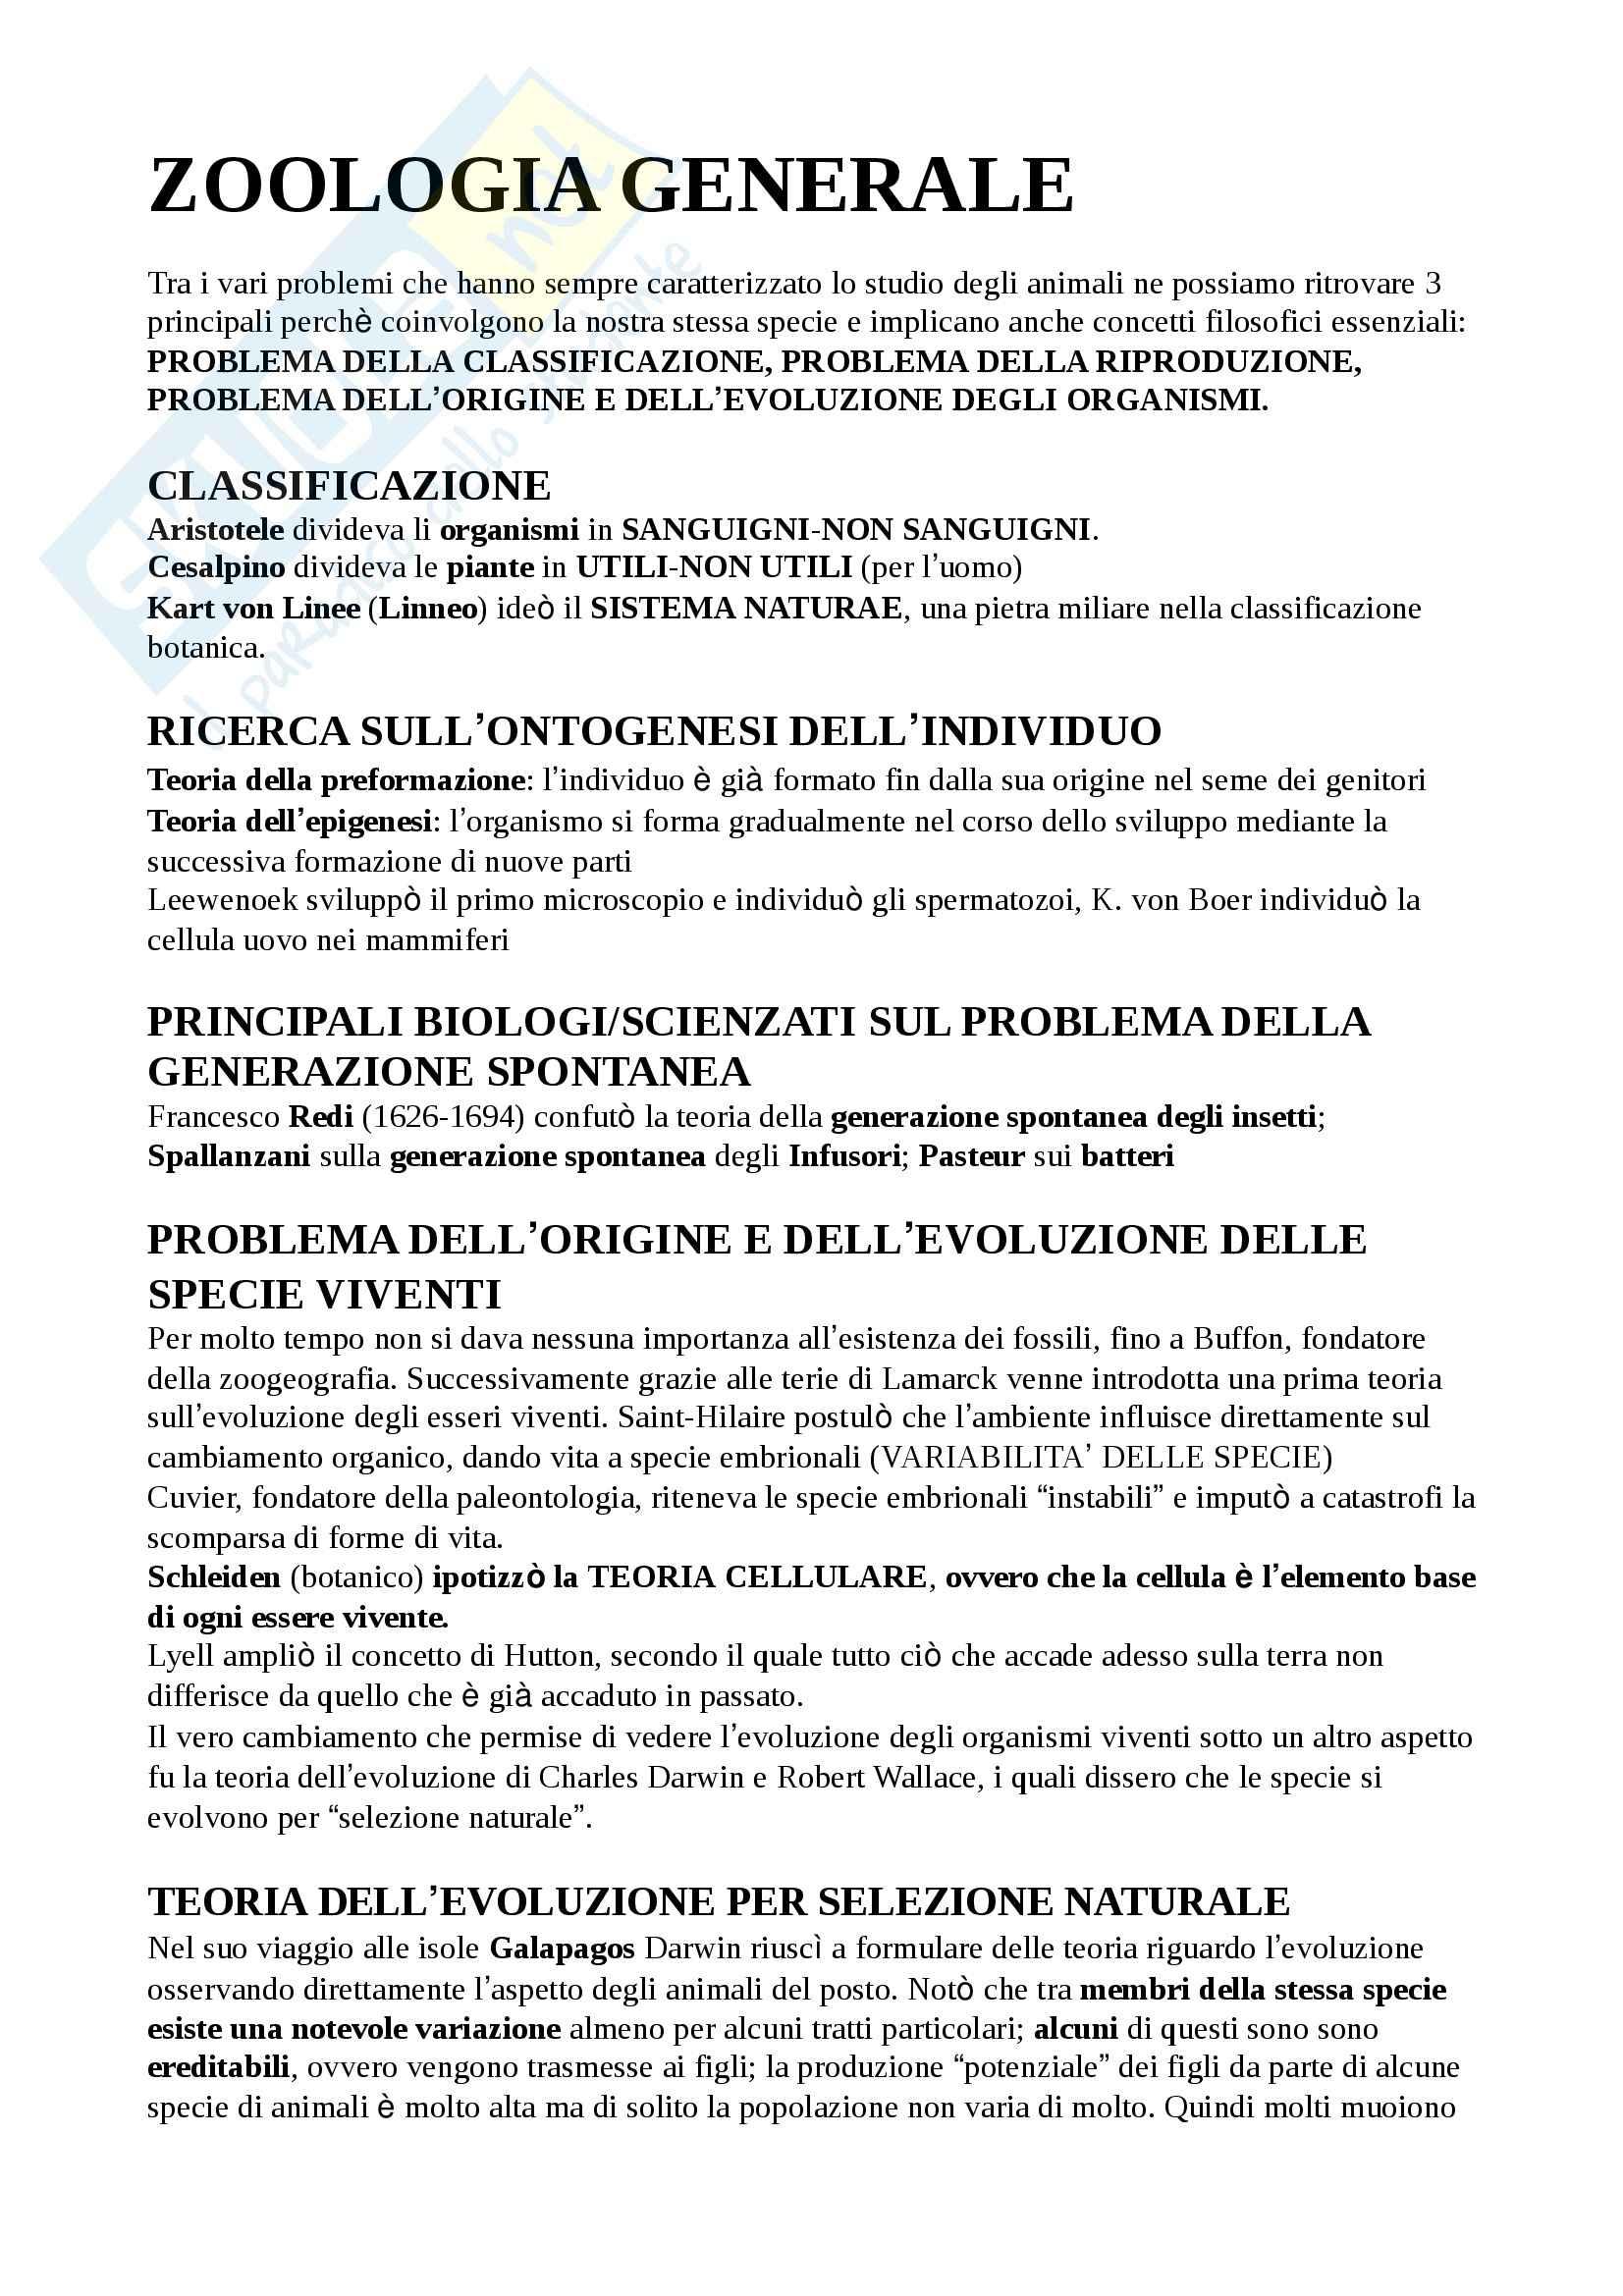 appunto S. Turilazzi Zoologia